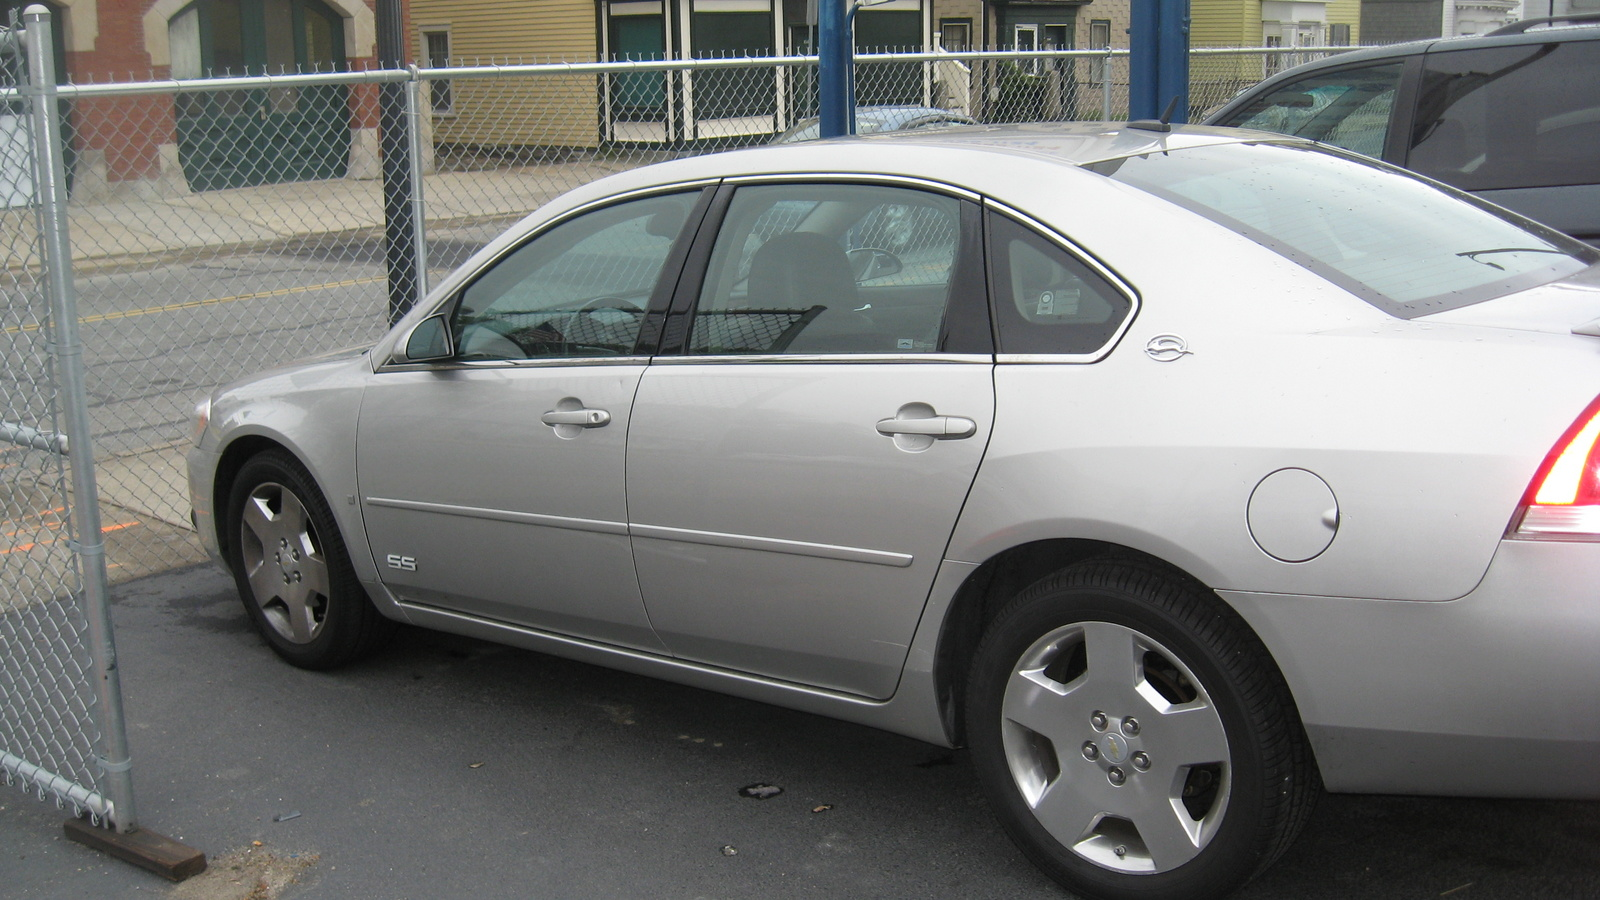 2006 chevy impala ss blend door actuator changeout autos post. Black Bedroom Furniture Sets. Home Design Ideas